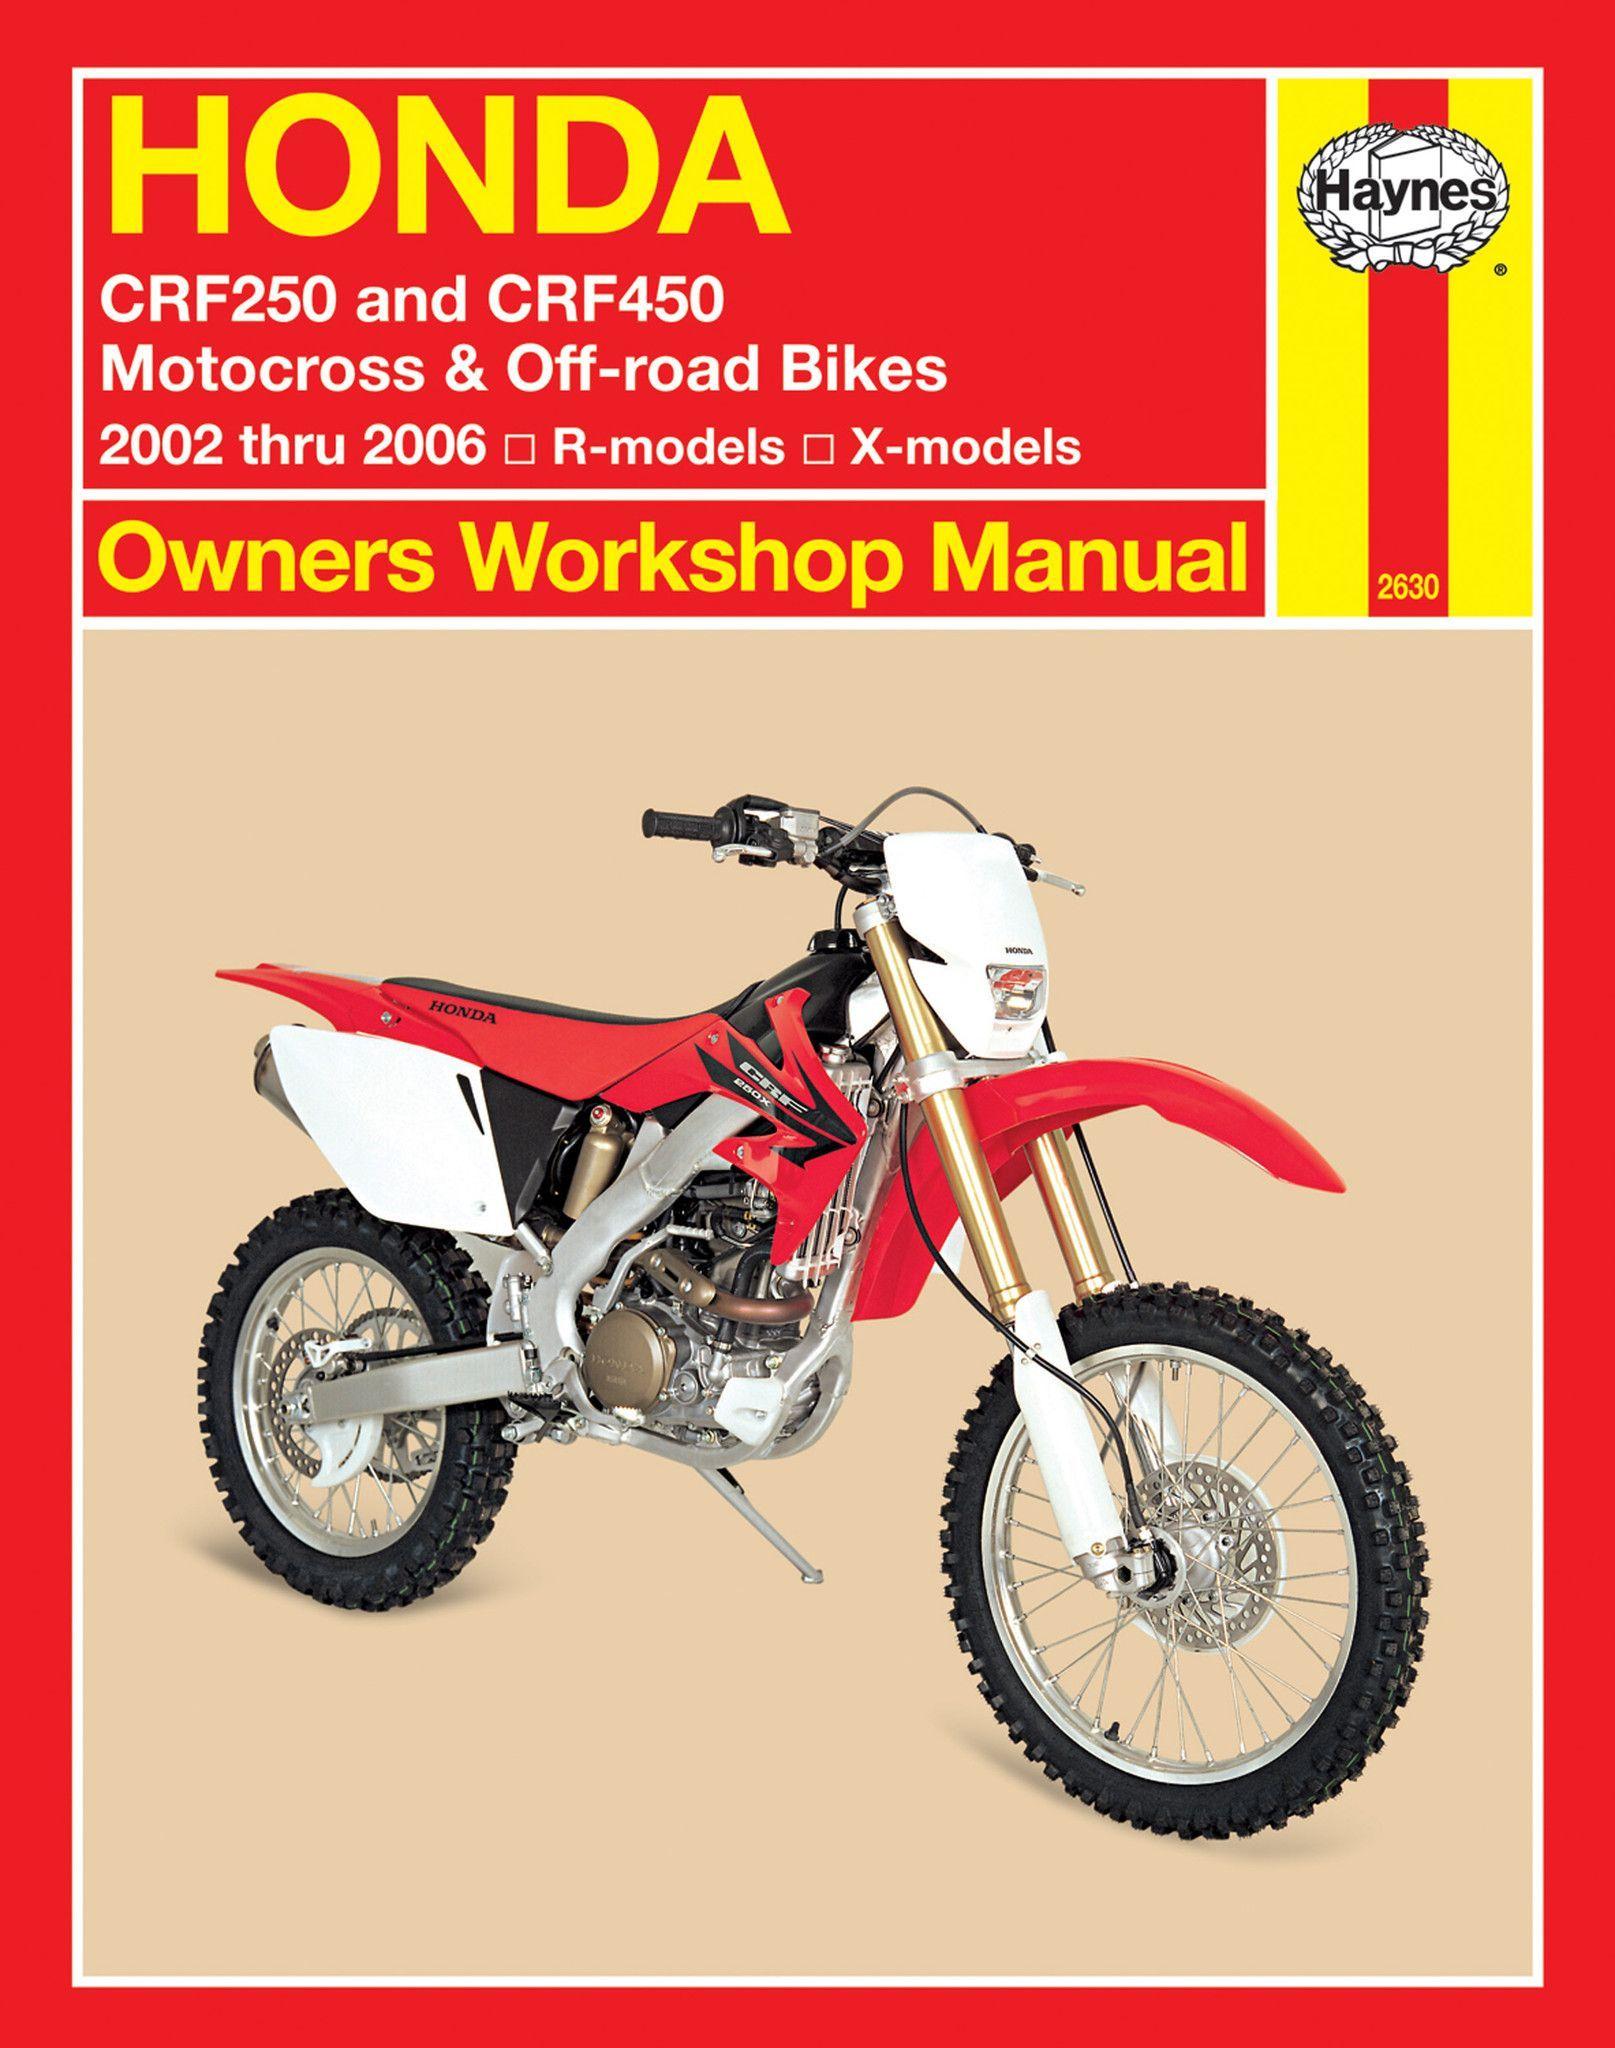 haynes m2630 repair manual for honda crf250r crf250x crf450r rh pinterest co uk honda crf150r owners manual pdf honda crf250r service manual 2012